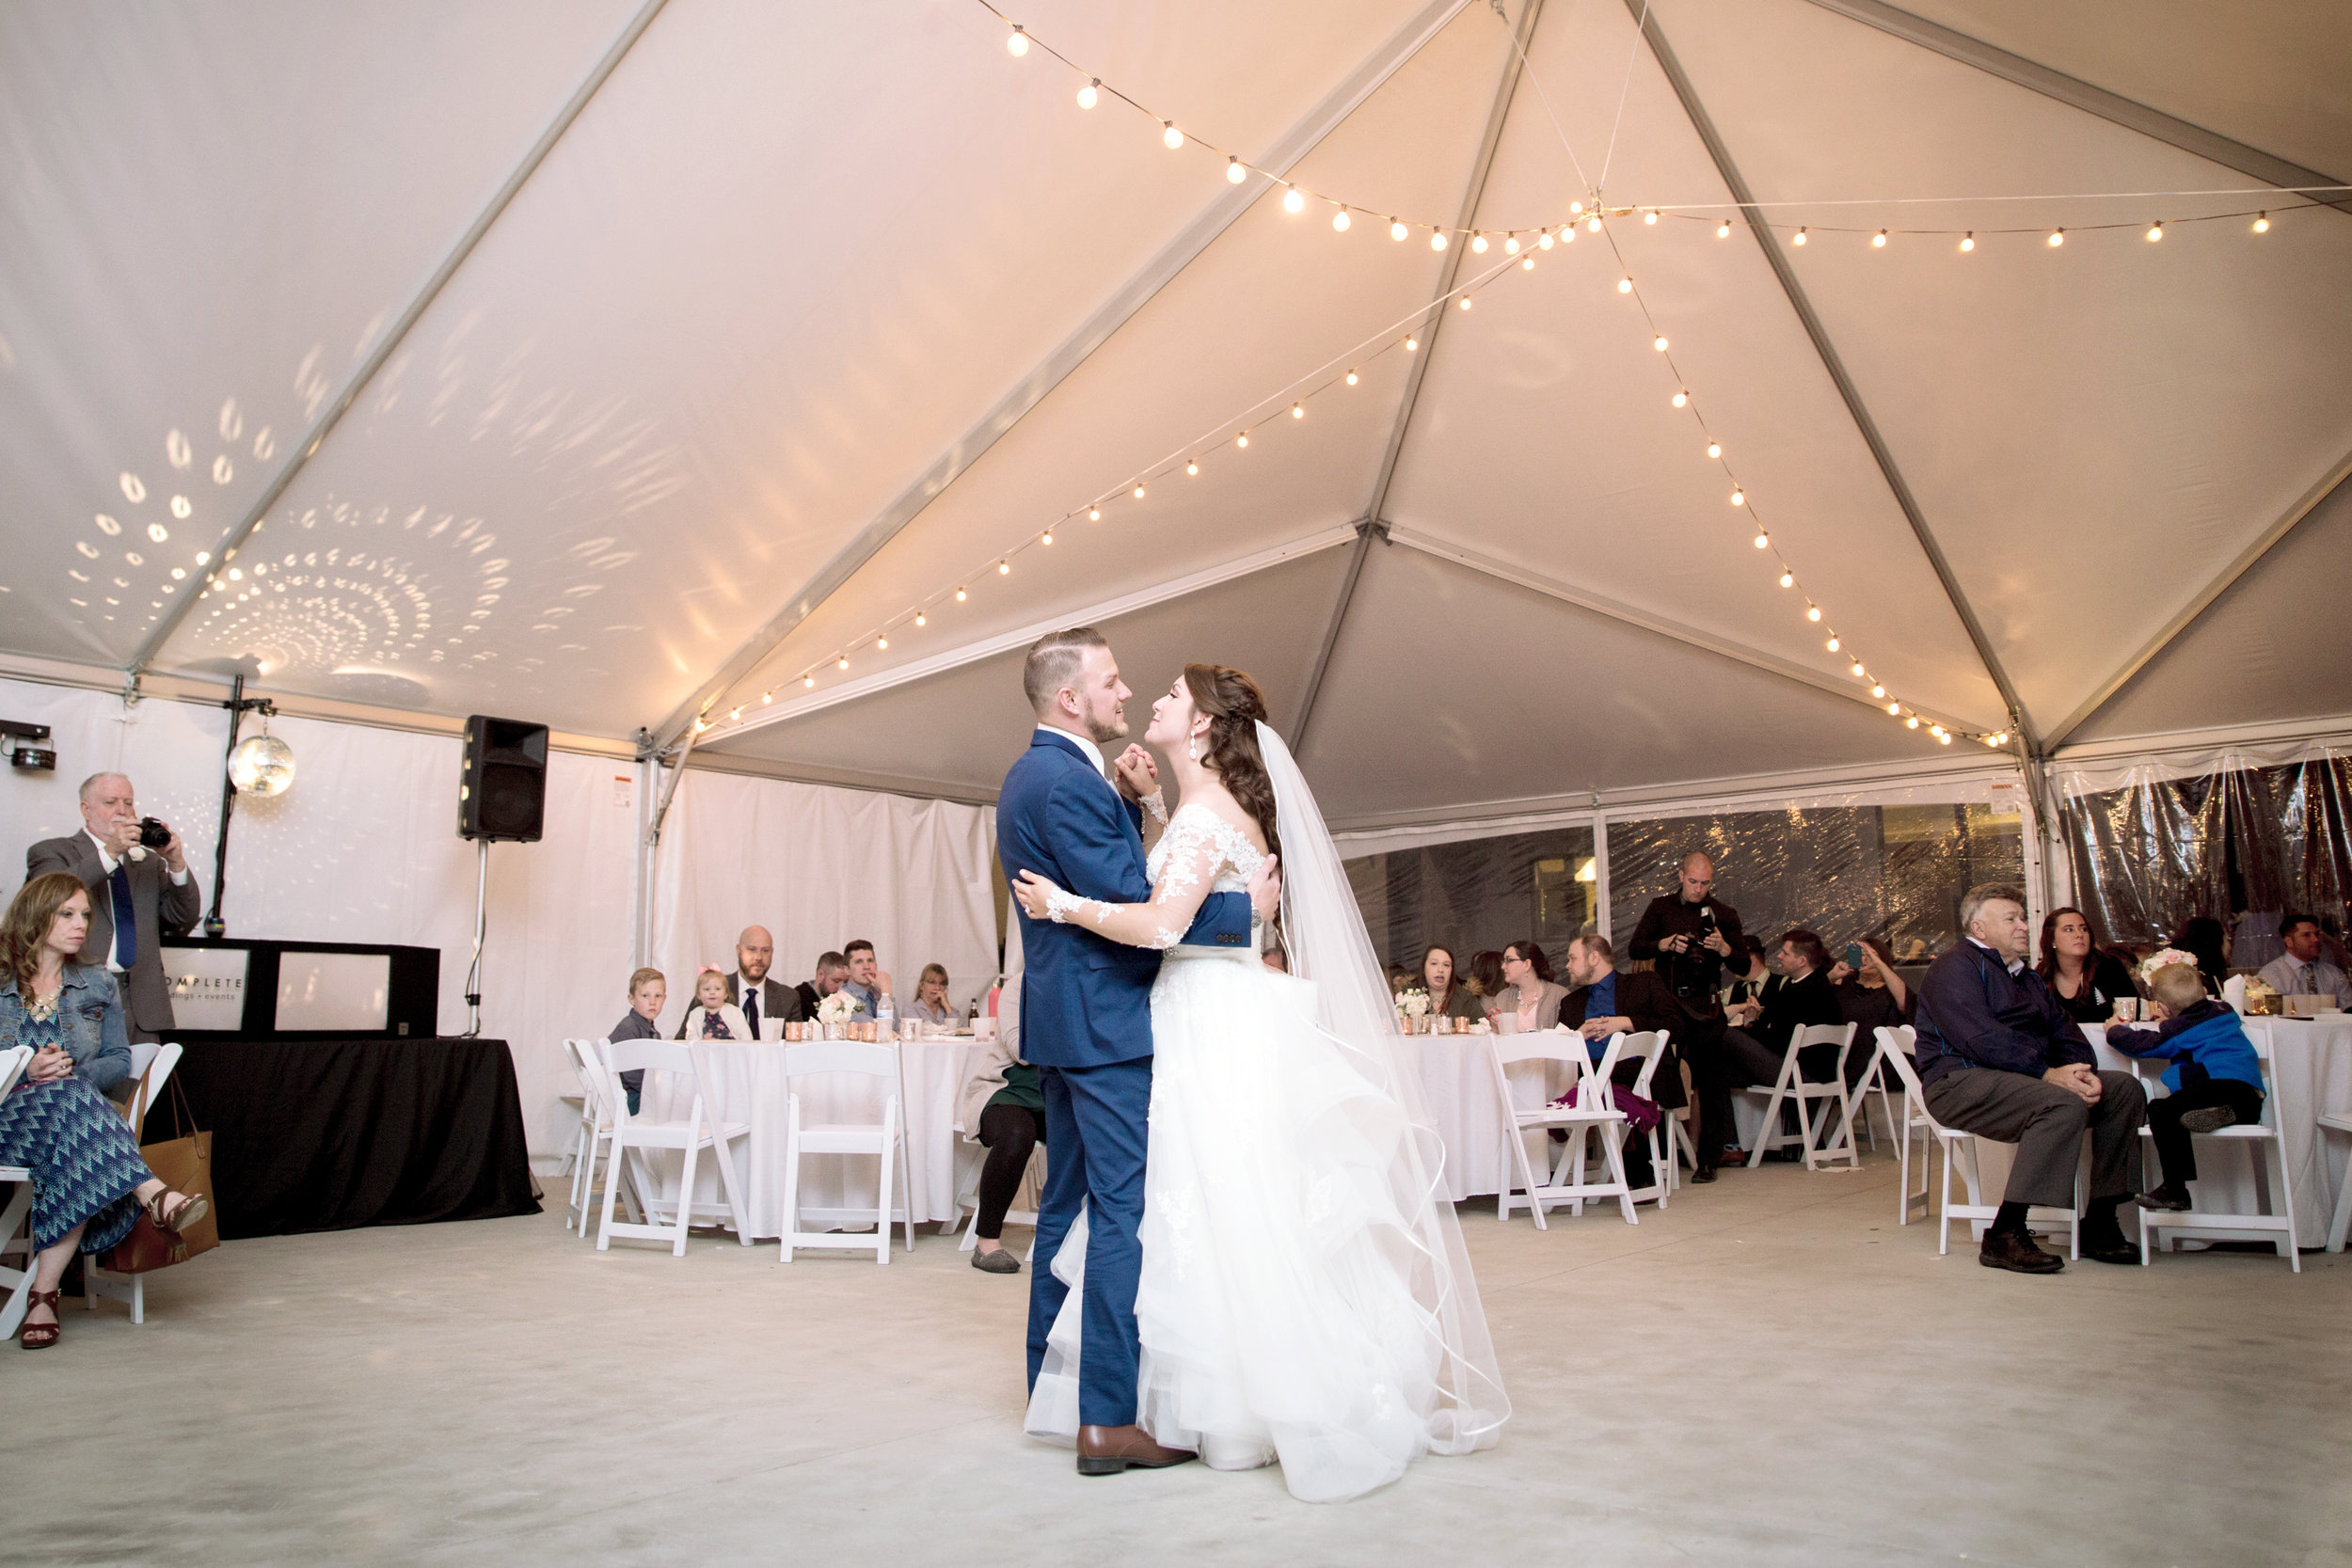 Sunset Bluffs St. Louis Wedding Venue